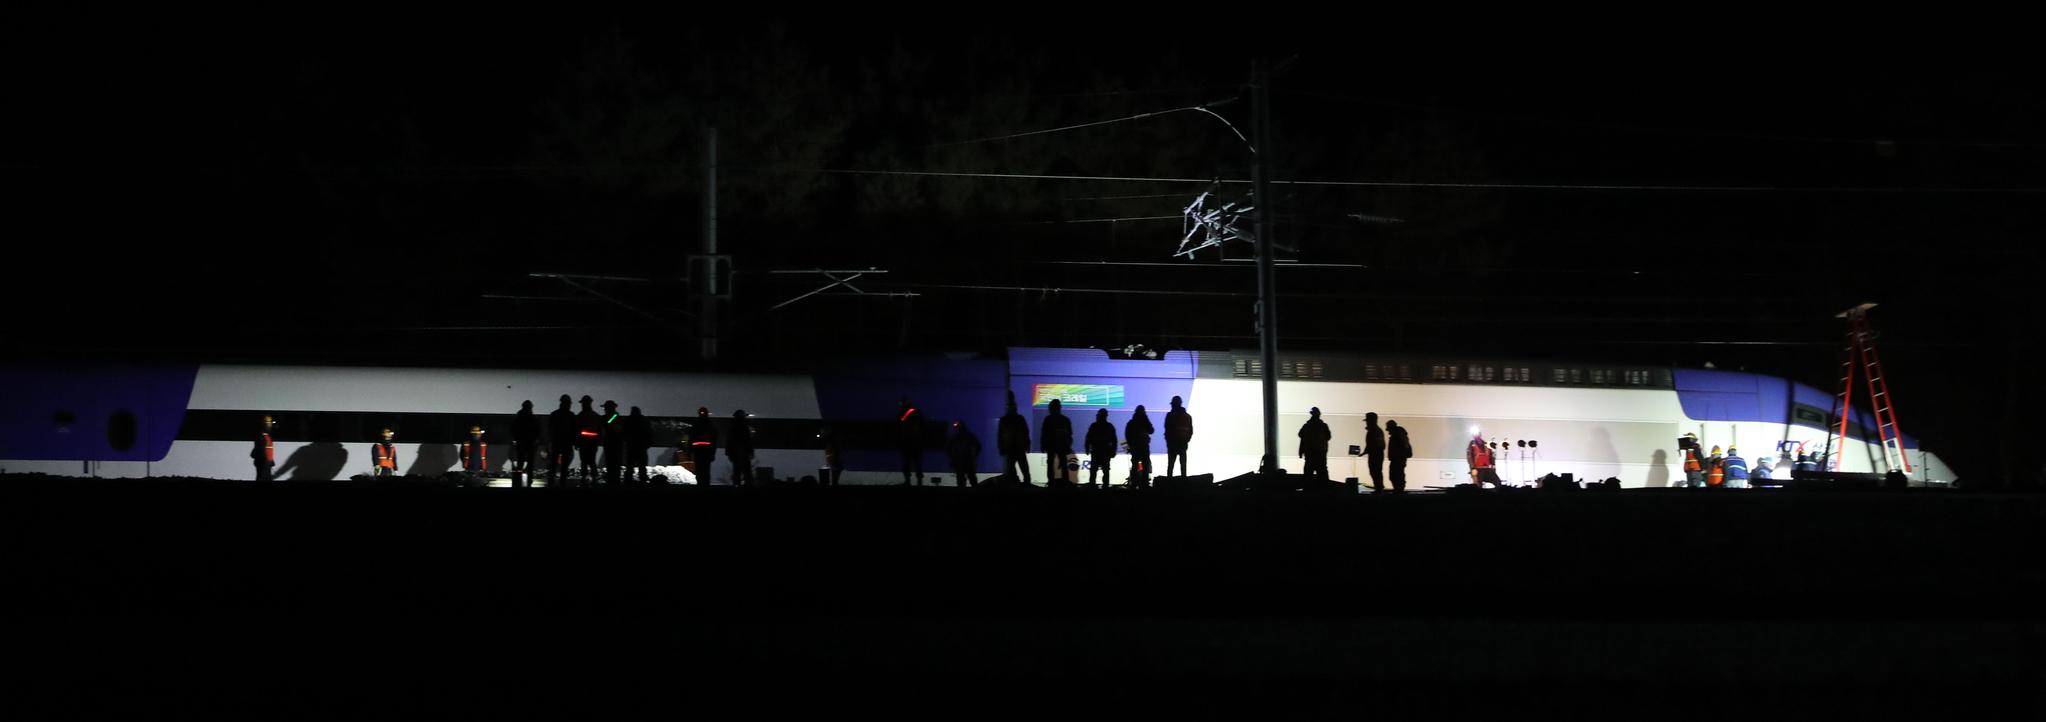 KTX열차 탈선사고가 발생한 강릉시 운산동 사고현장에서 8일밤 관계자들이 복구 작업을 하고 있다. 우상조 기자